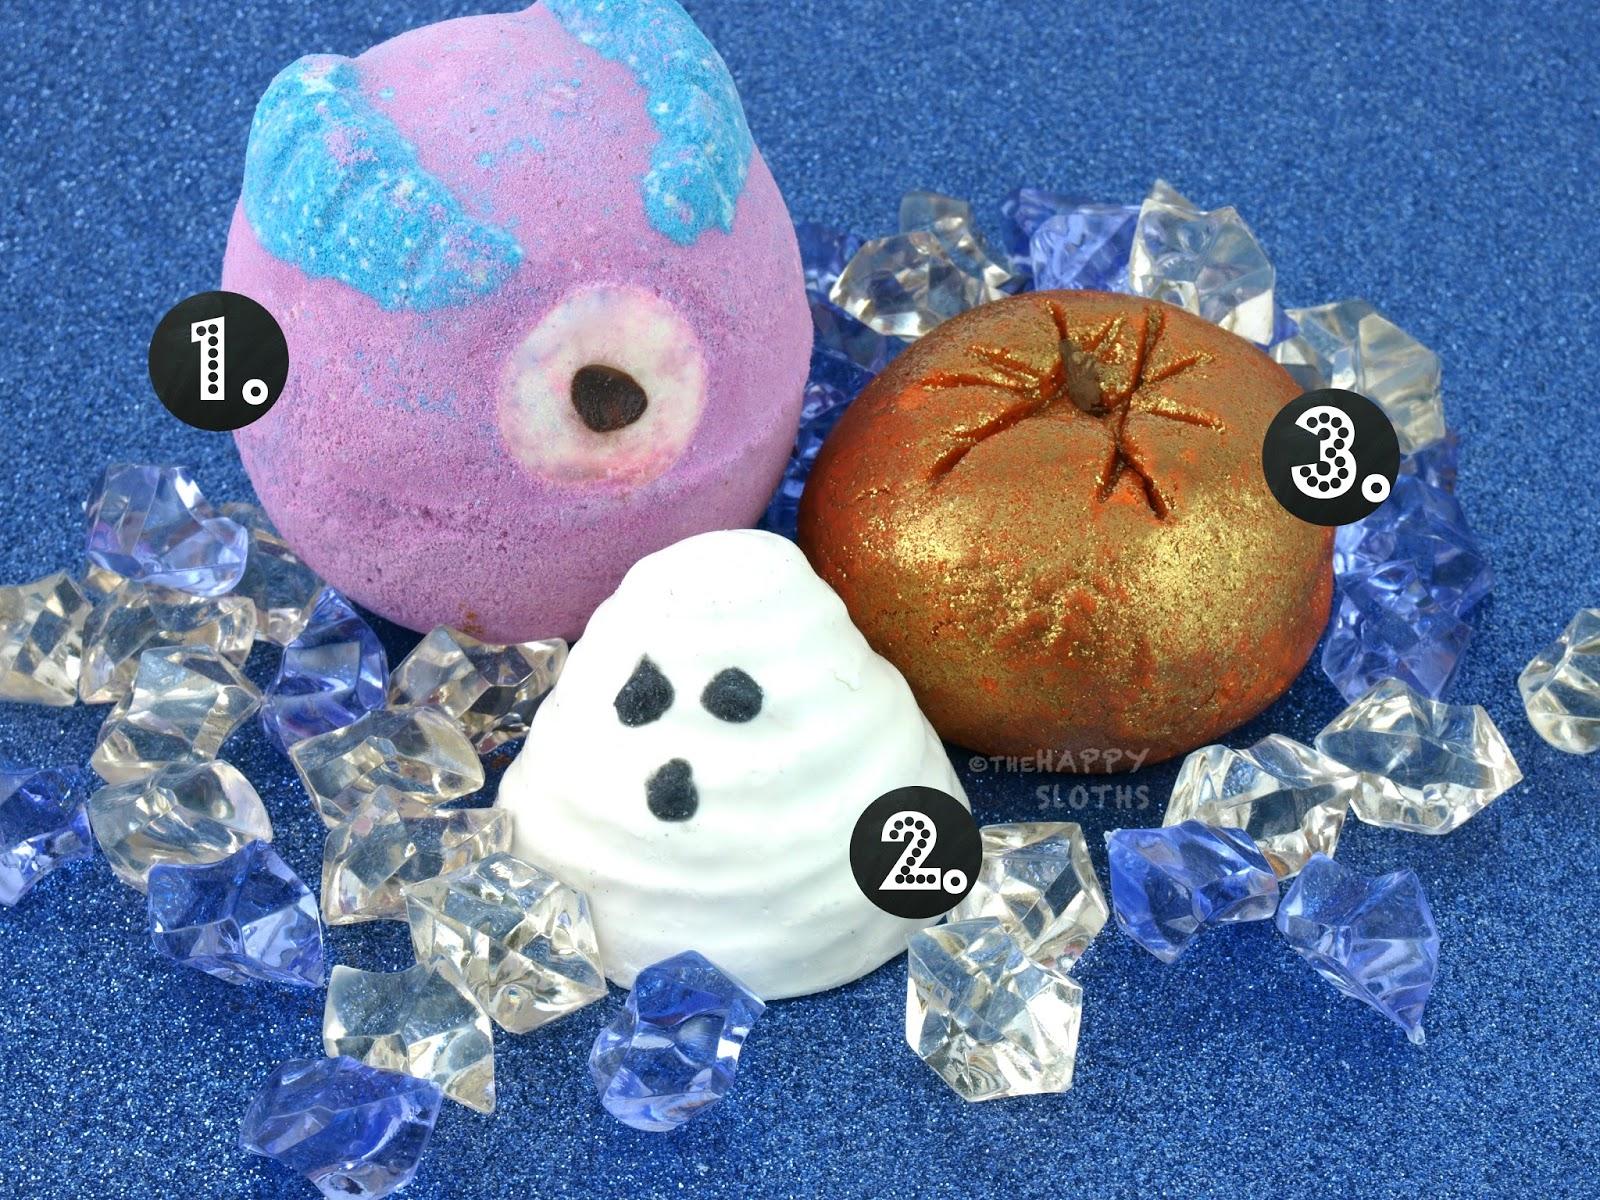 Lush Halloween Monsters Ball Sparkly Pumpkin Boo